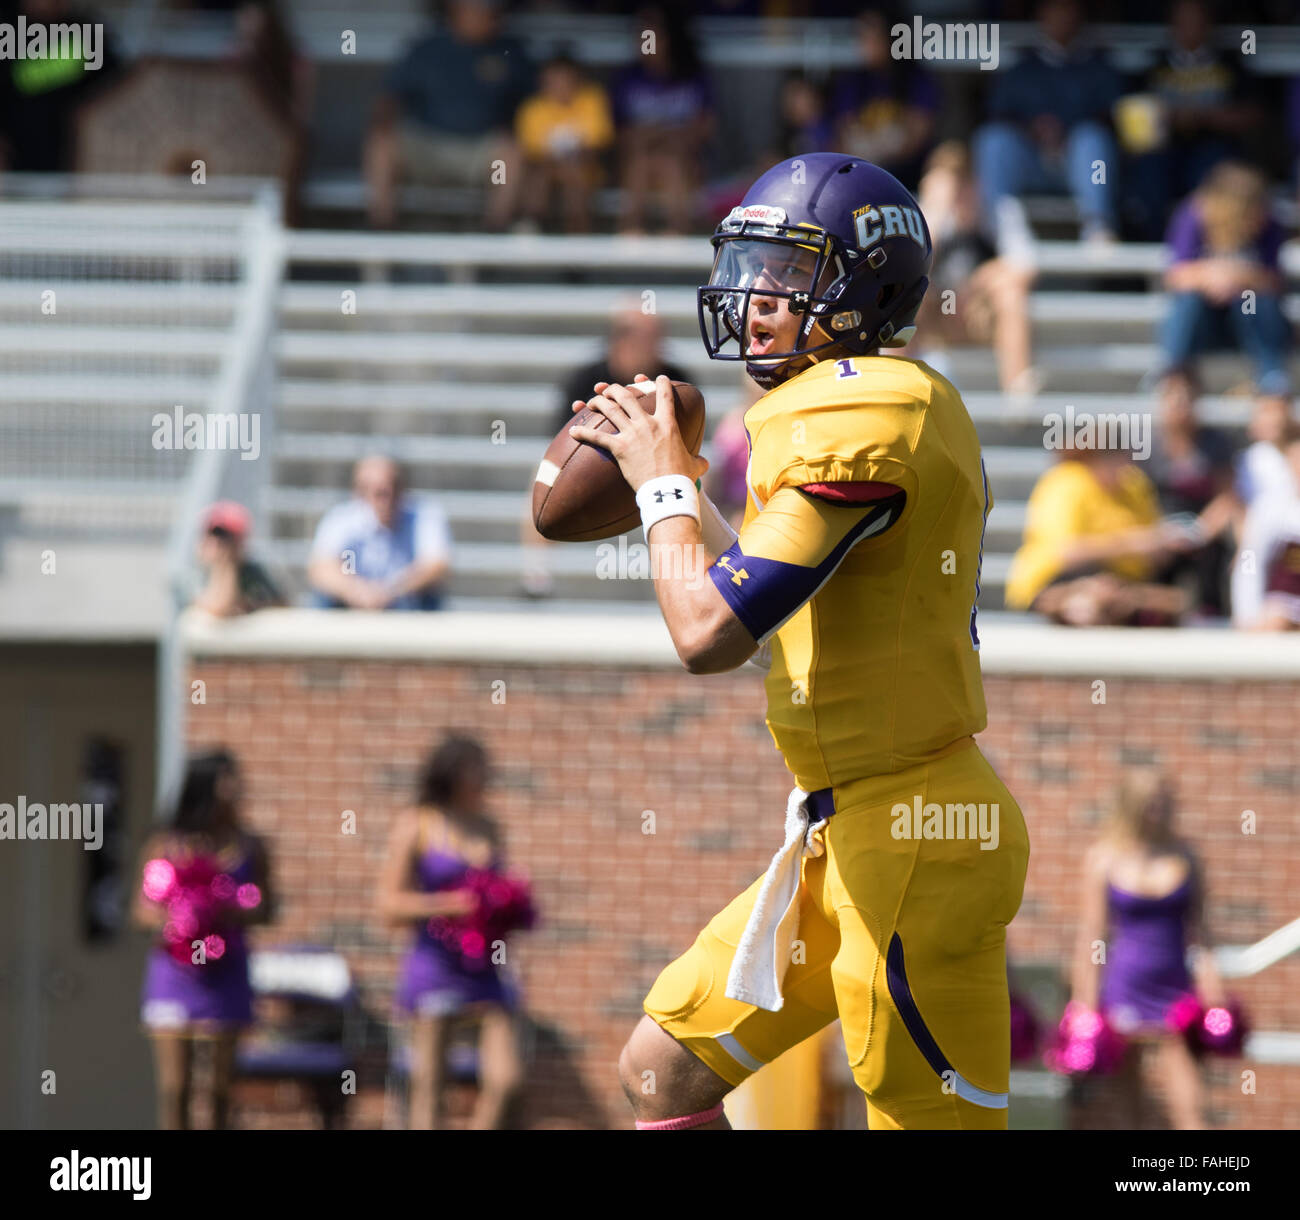 Belton, Texas, USA. 10th Oct, 2015. University of Mary Hardin-Baylor quarterback Zach Anderson. Stock Photo